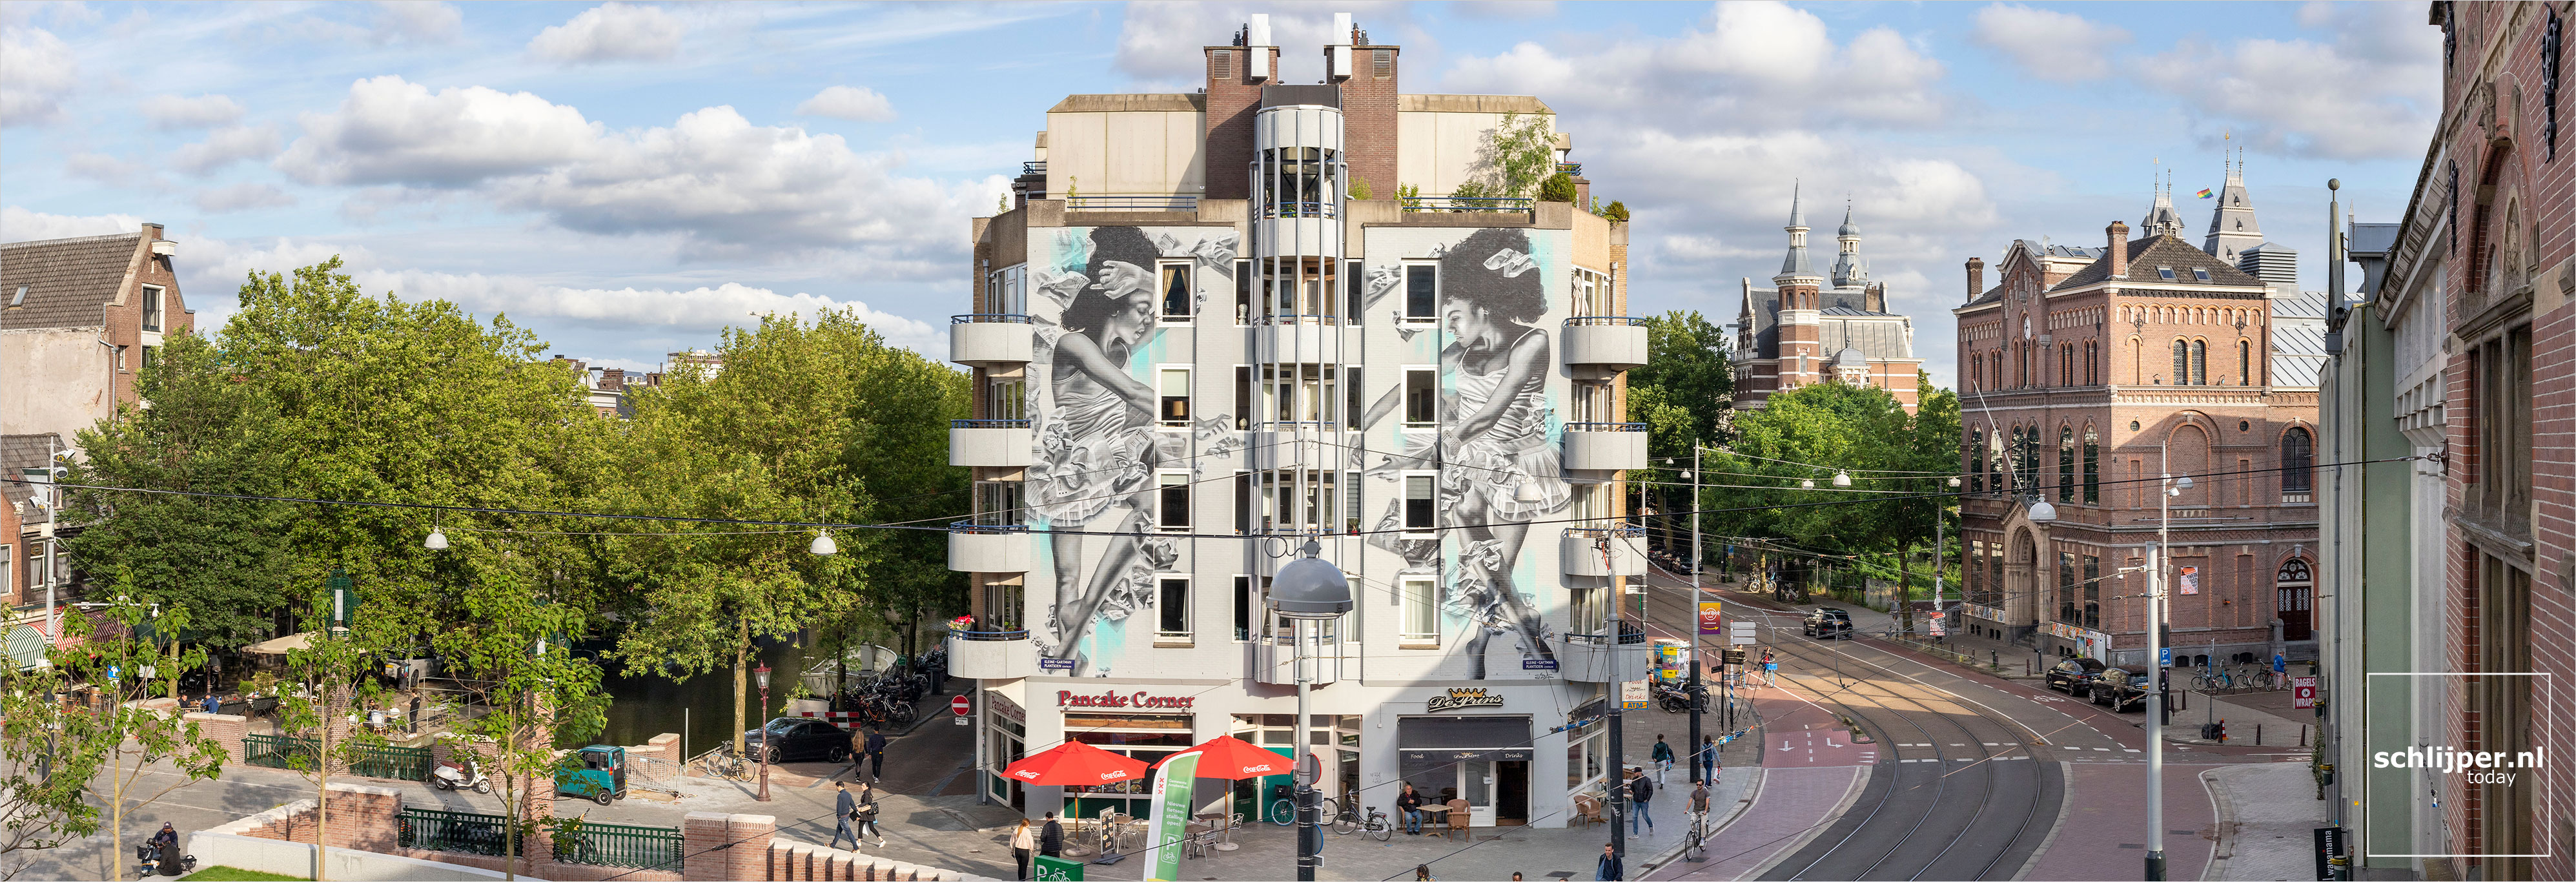 The Netherlands, Amsterdam, 1 augustus 2021